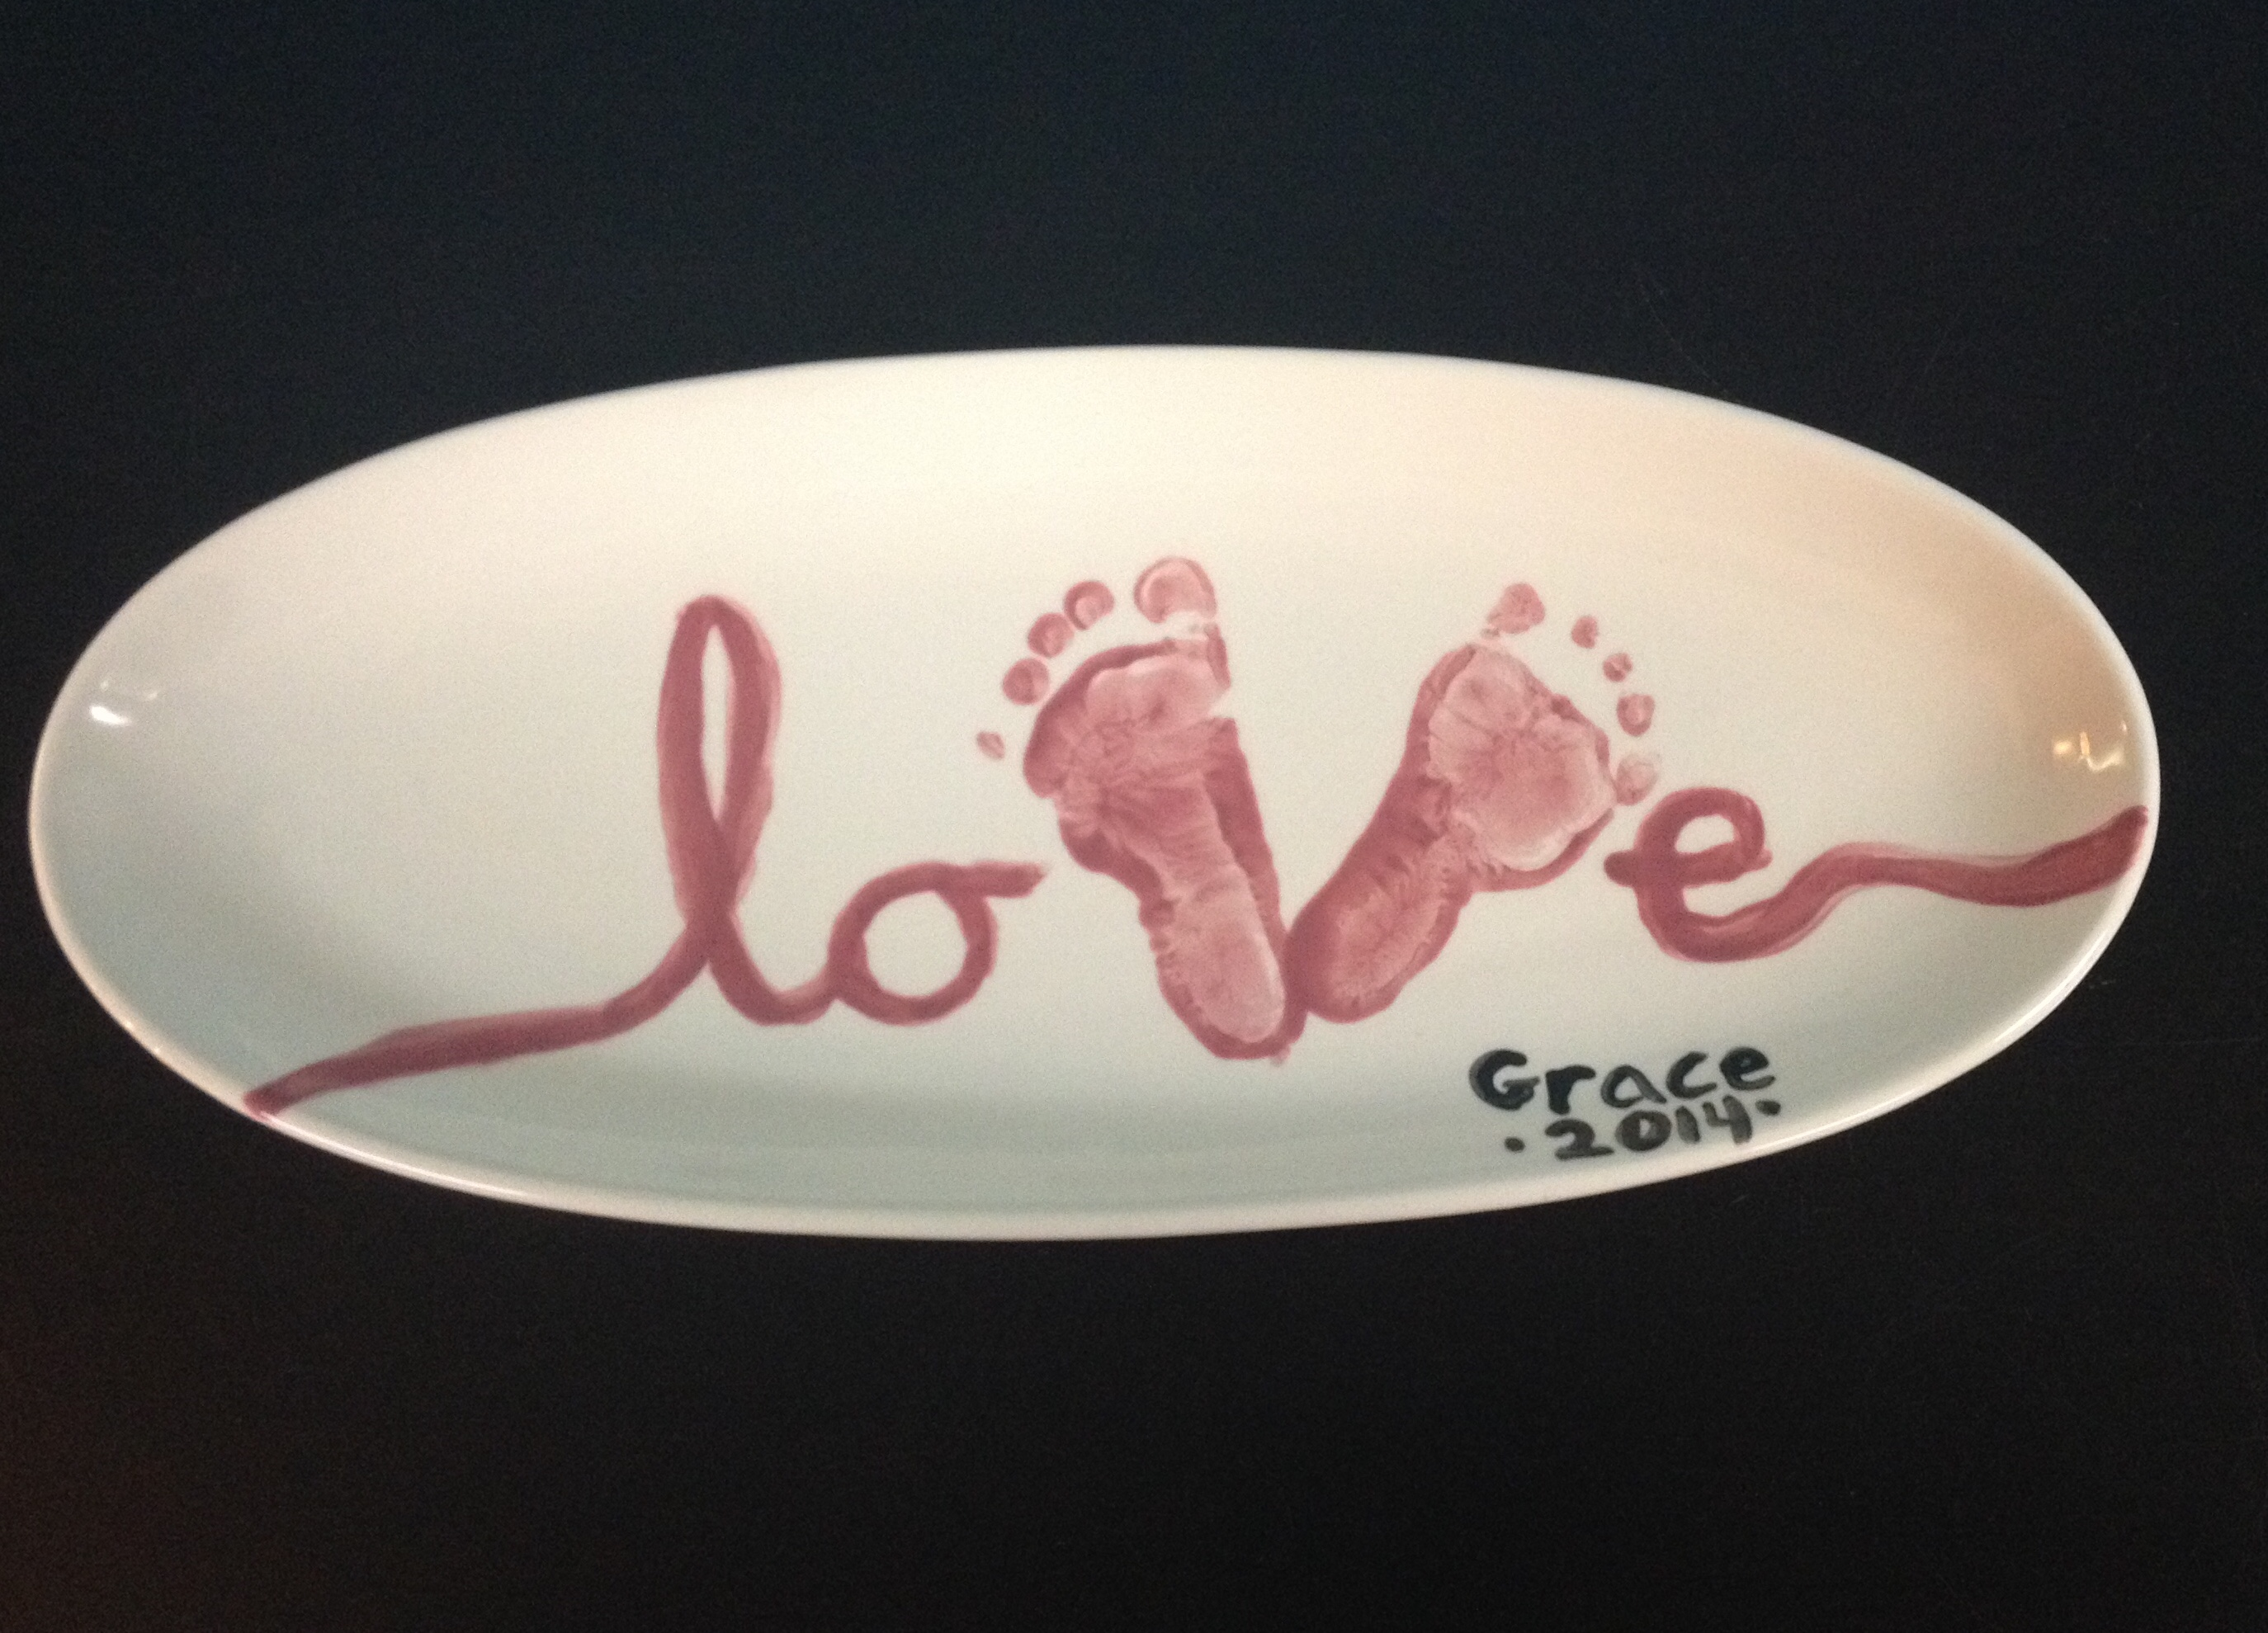 Love footprint plate